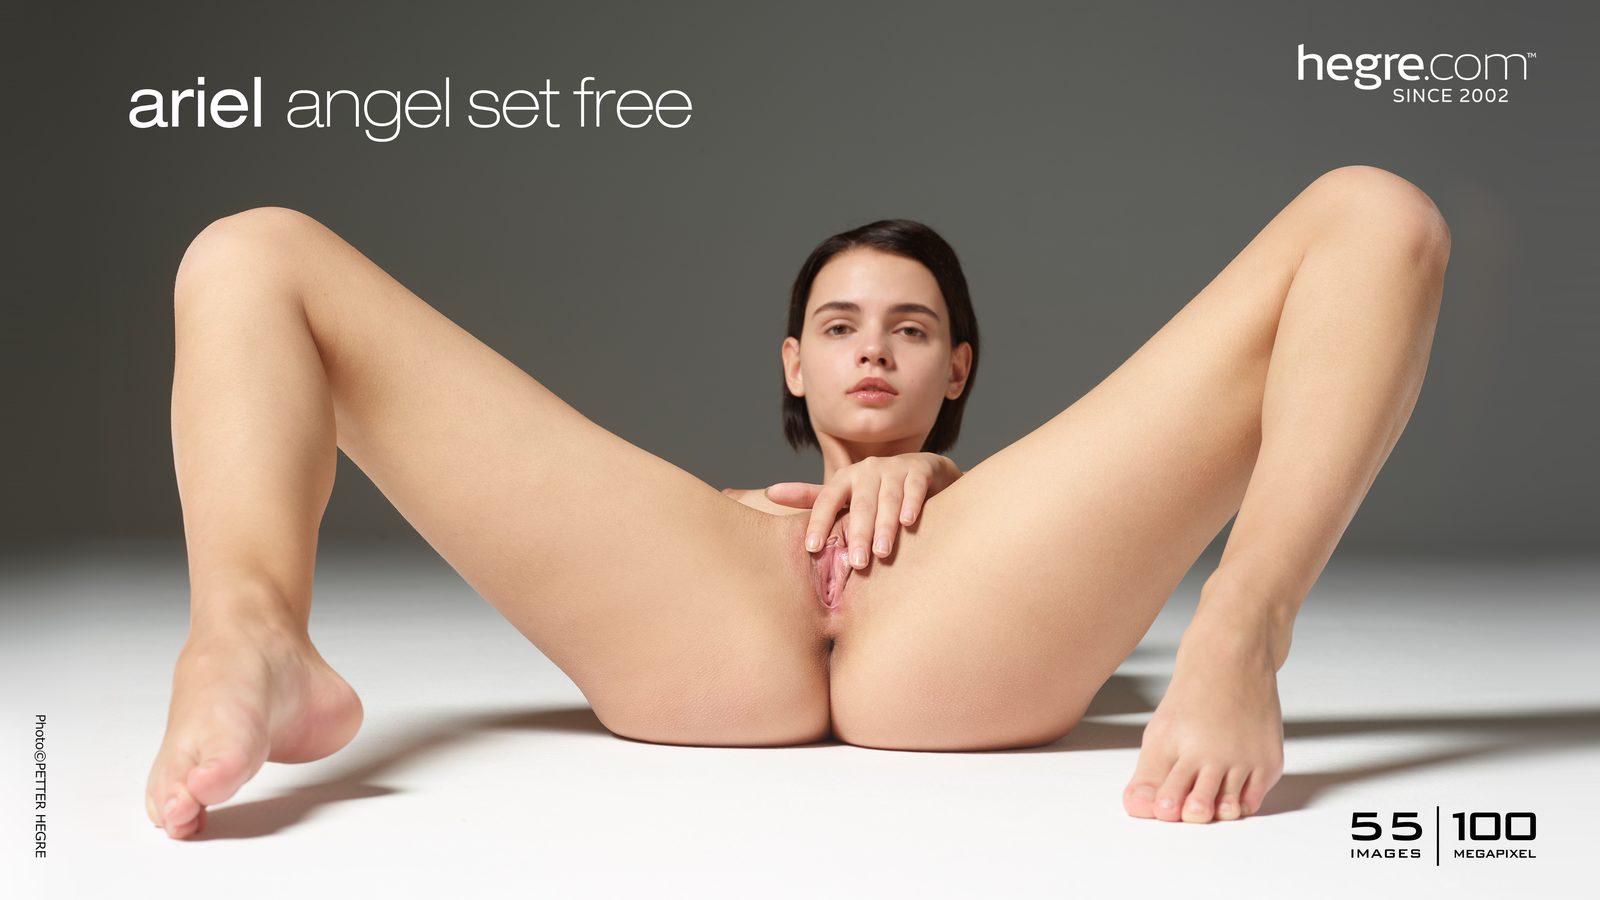 Hegre Free